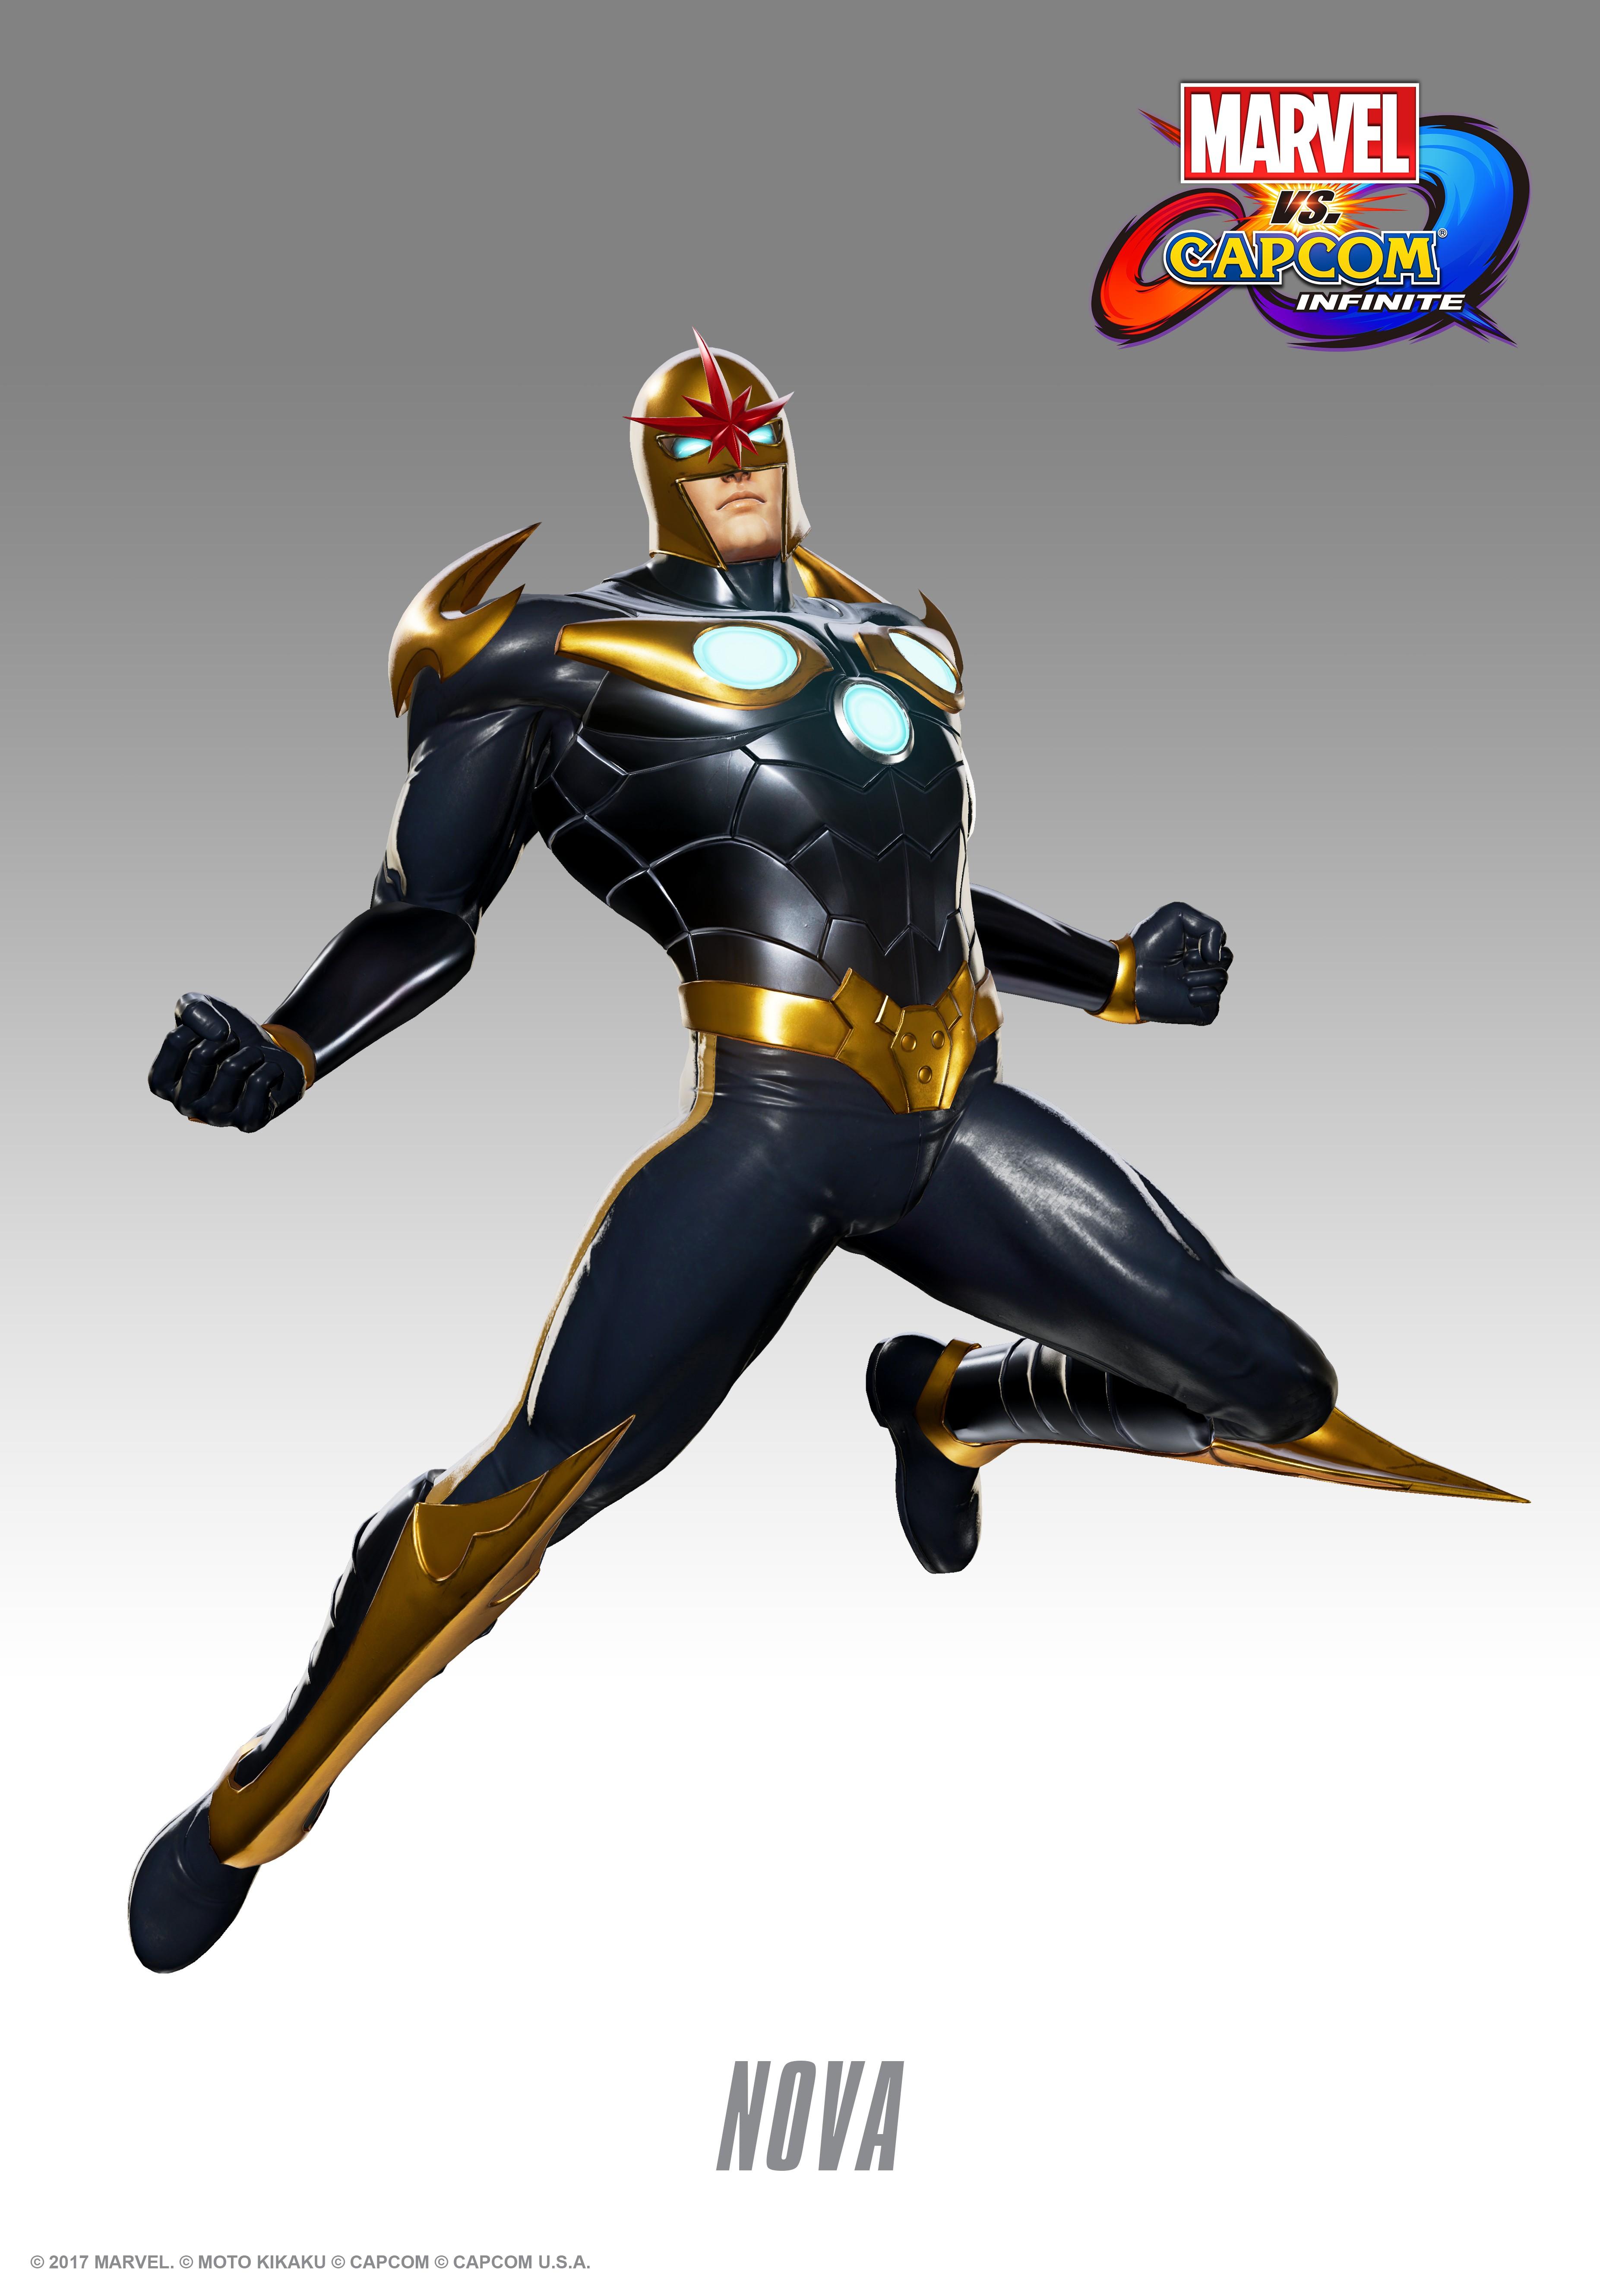 Нова - Marvel vs. Capcom: Infinite Арт, Персонаж